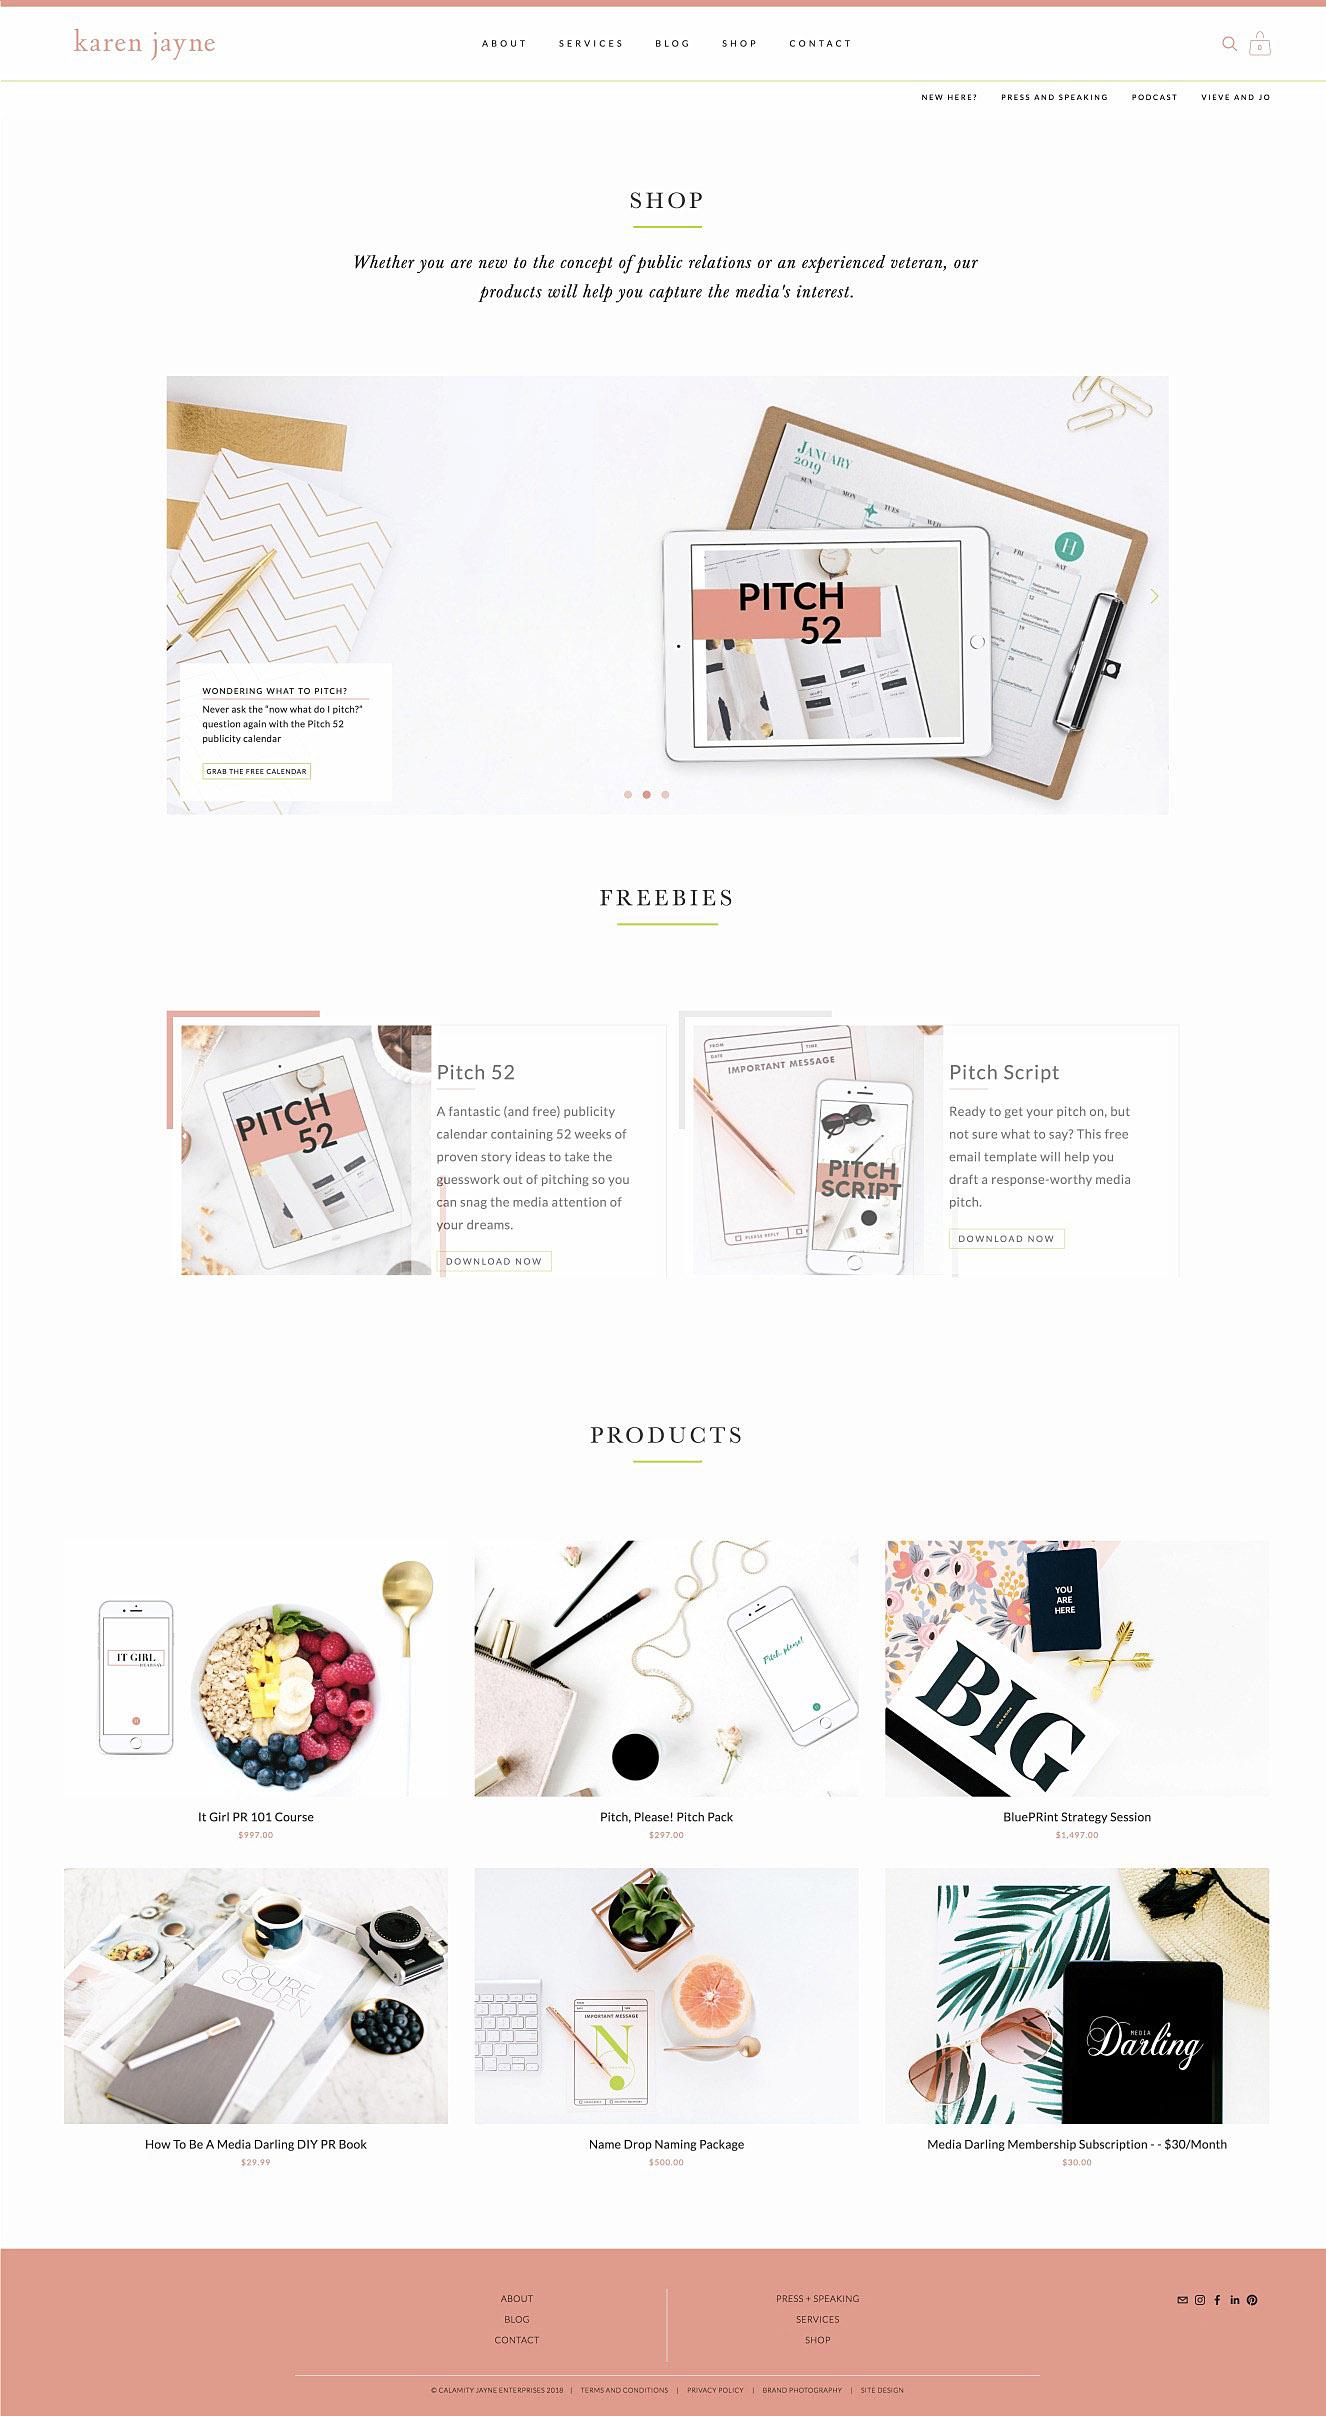 KJ Blattenbauer Shop page | Clean and minimal Squarespace web design by Jodi Neufeld Design #squarespace #webdesign